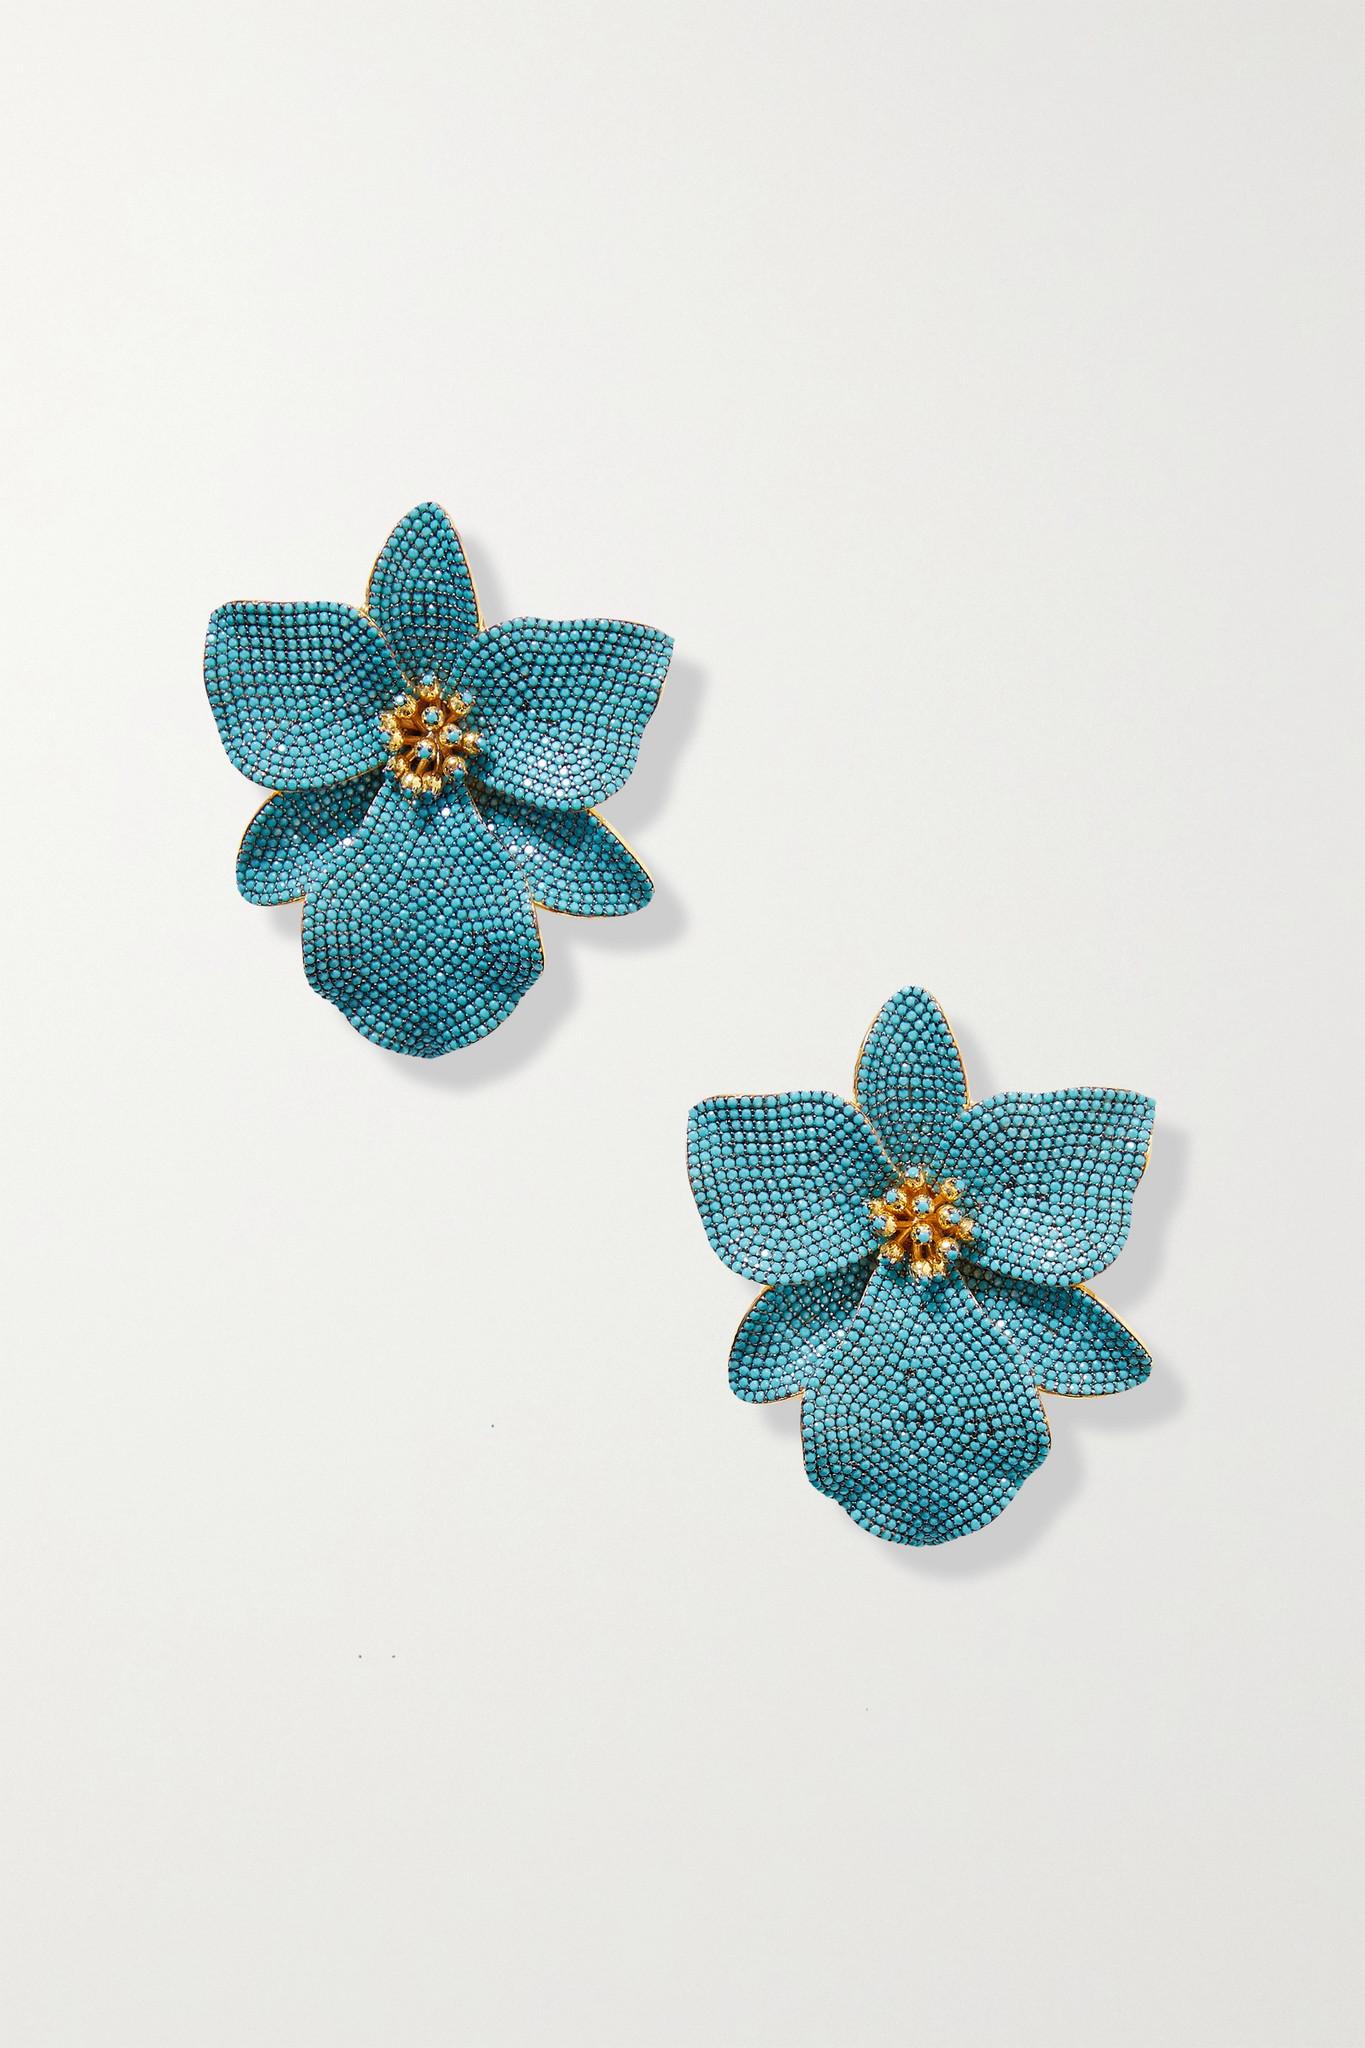 BEGÜM KHAN - Singapore Orchids 镀金、人造绿松石、搪瓷夹扣式耳环 - 蓝色 - one size